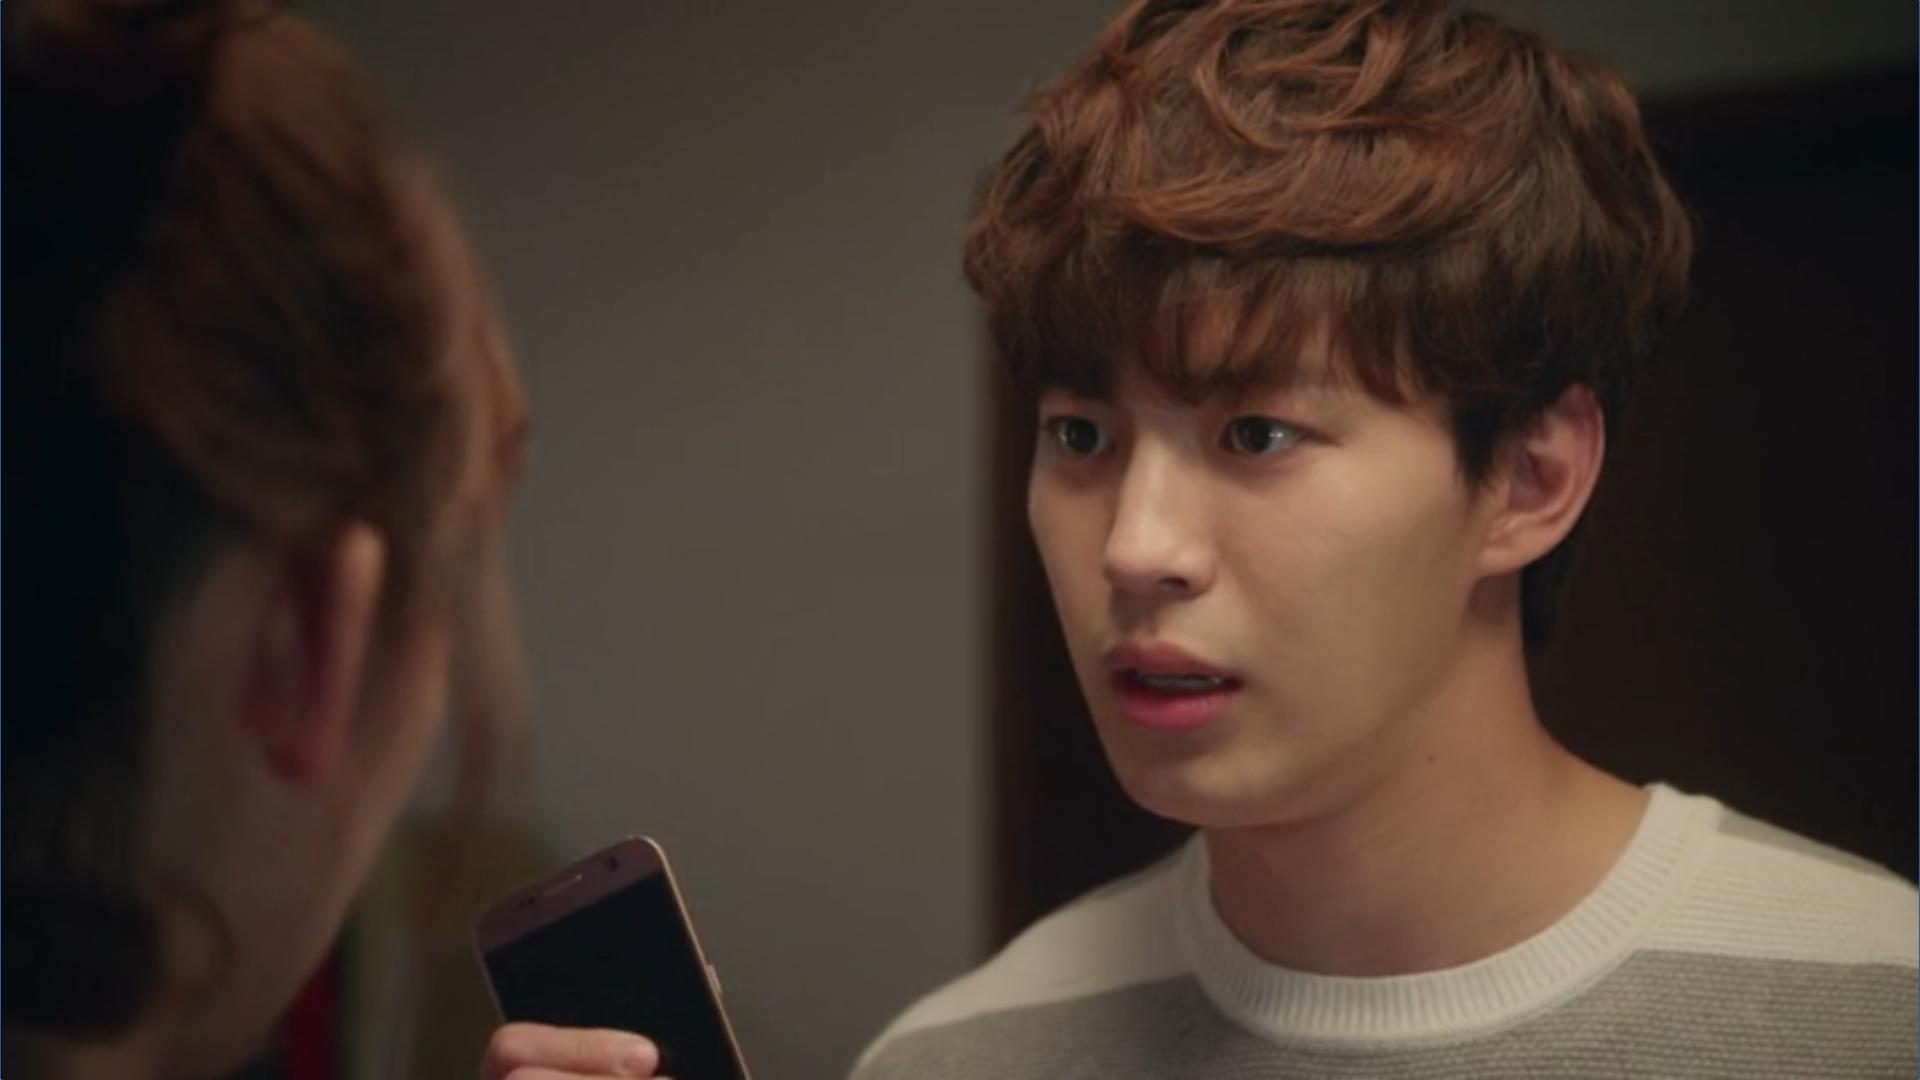 Wednesday 3:30 PM Yoon Jae-won grabbing Seon Eun-woo's phone